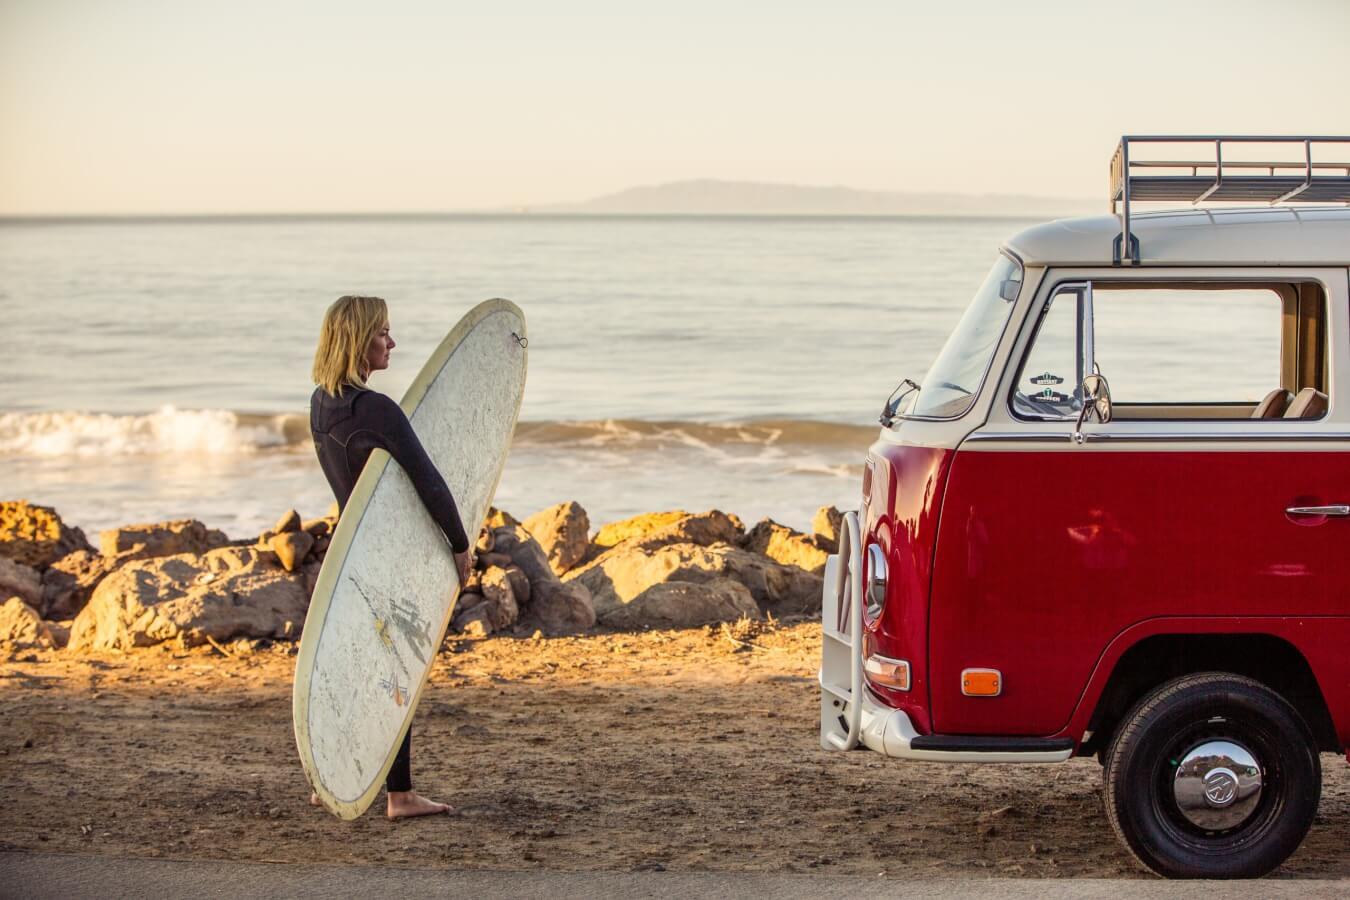 Surfer on the beach in Ventura, CA